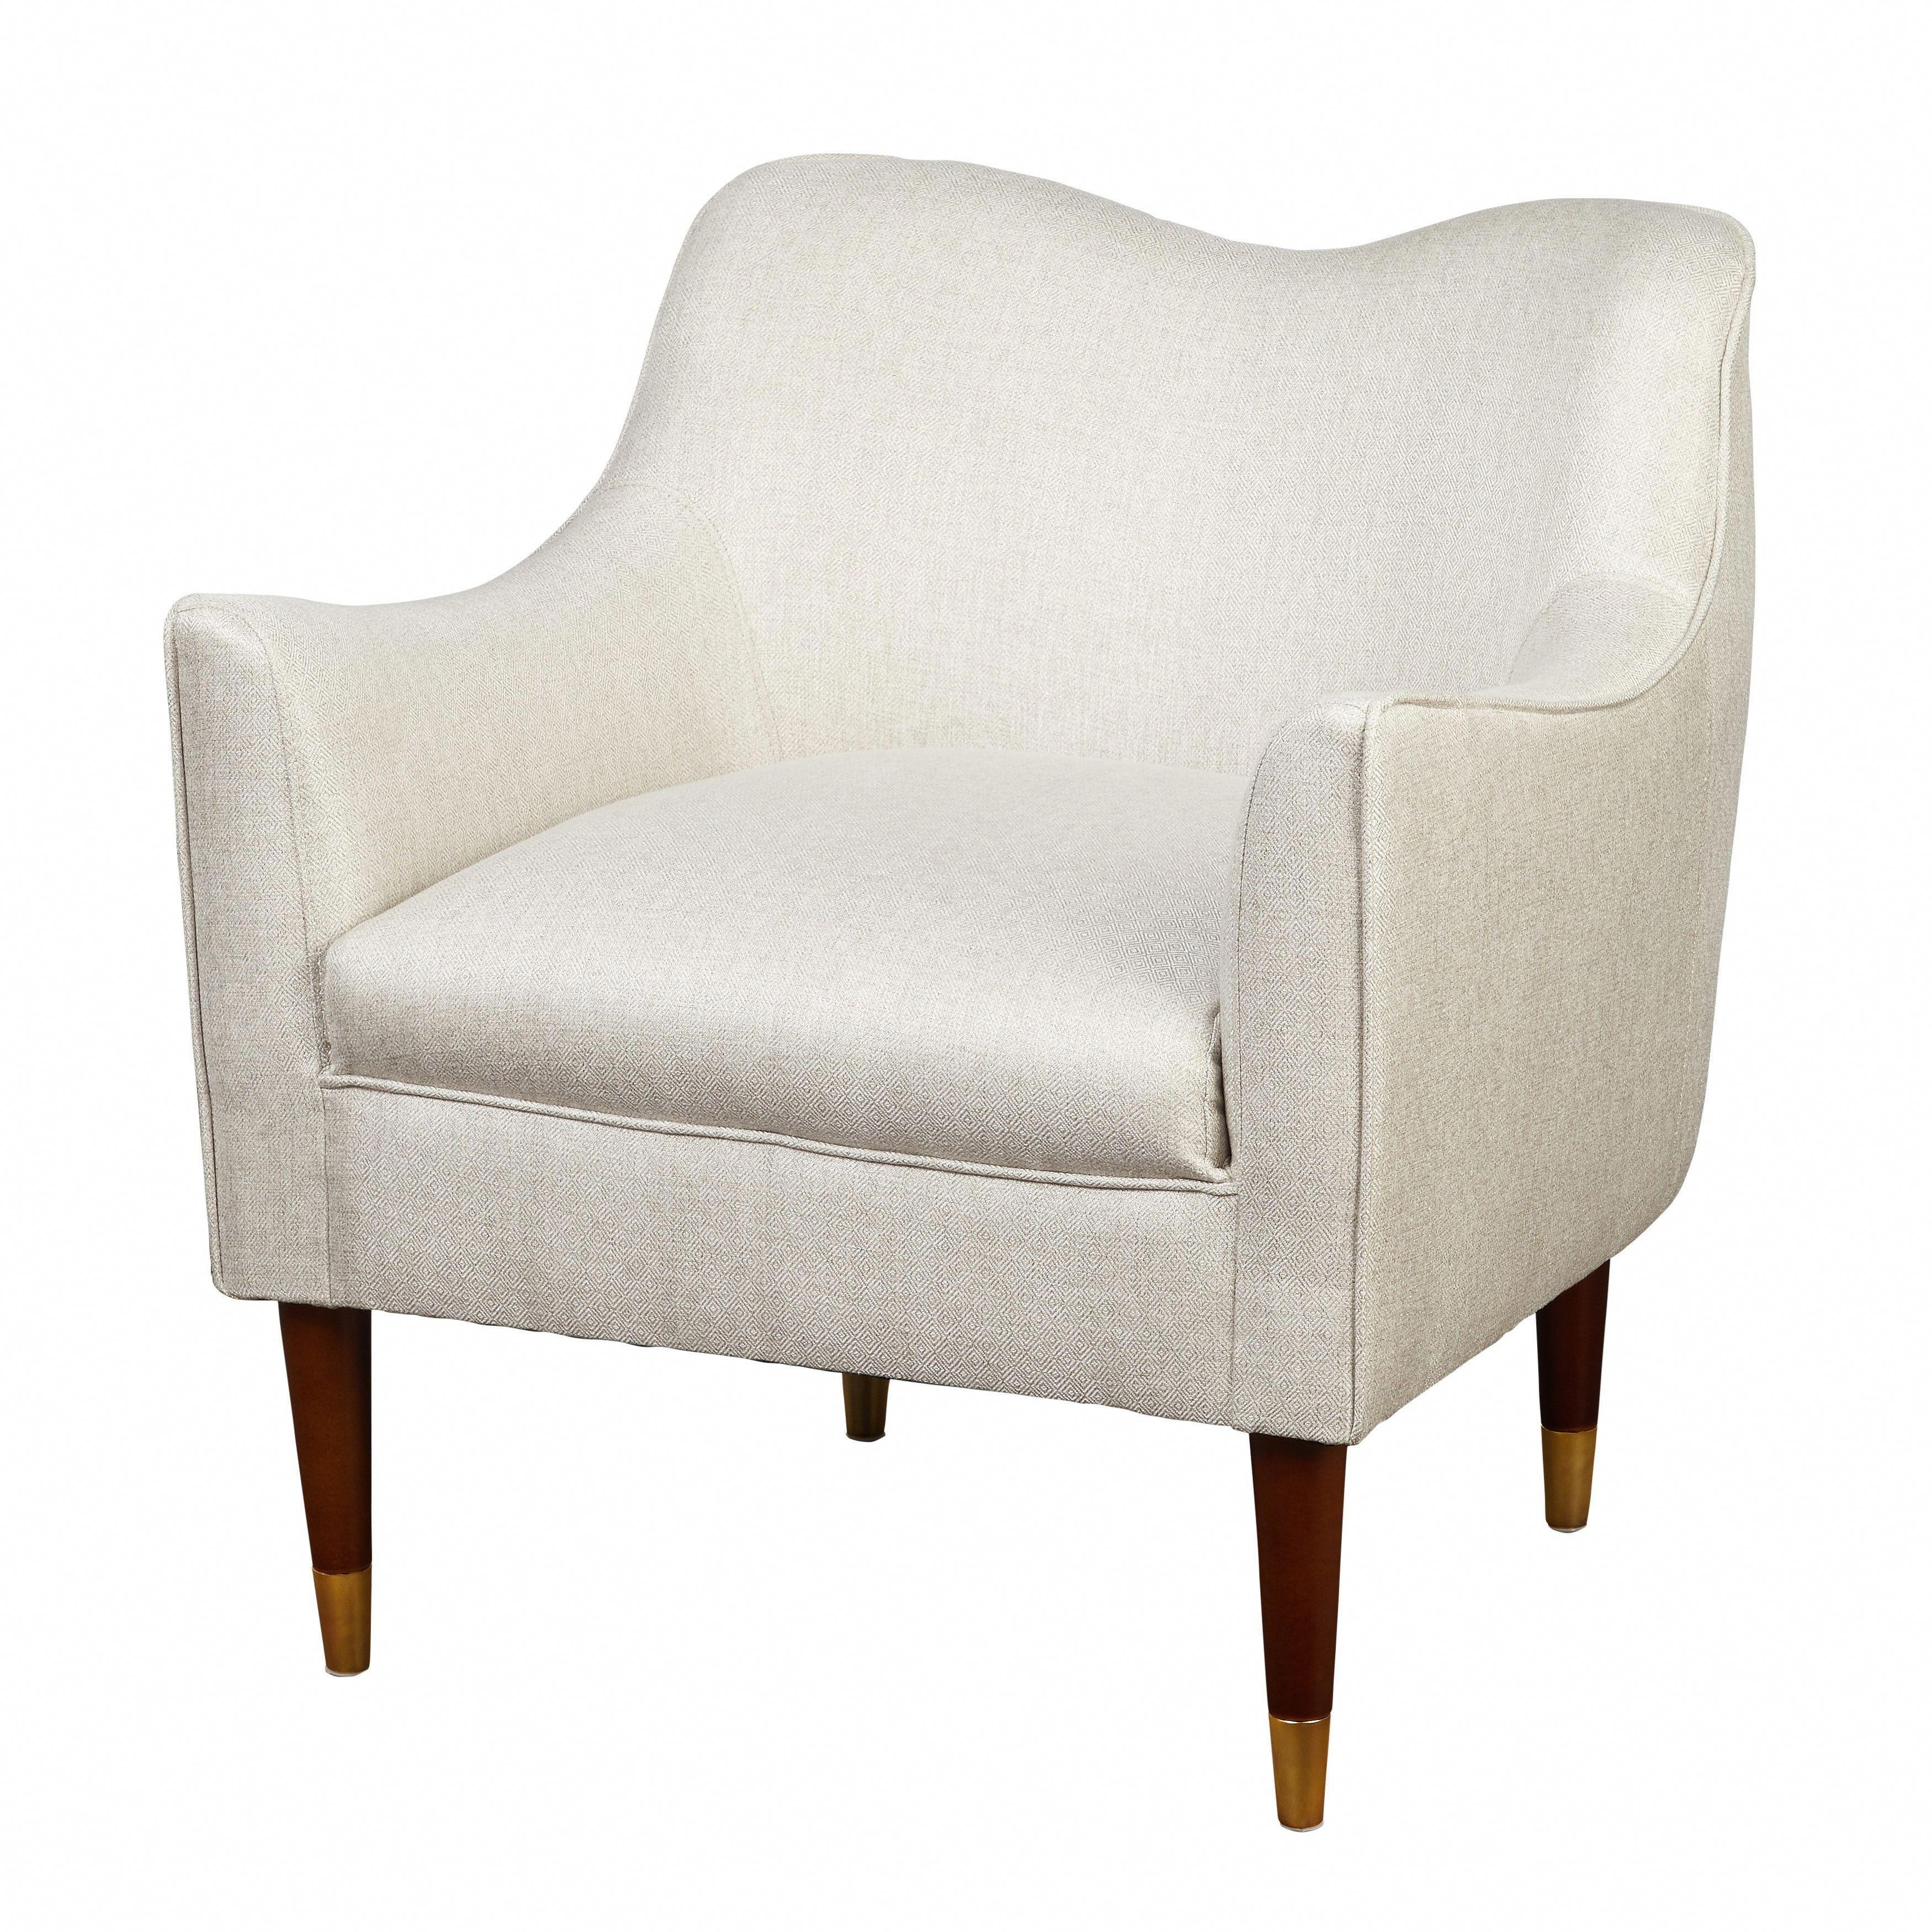 Lifestorey Emma Accent Chair tealaccentchair Chair